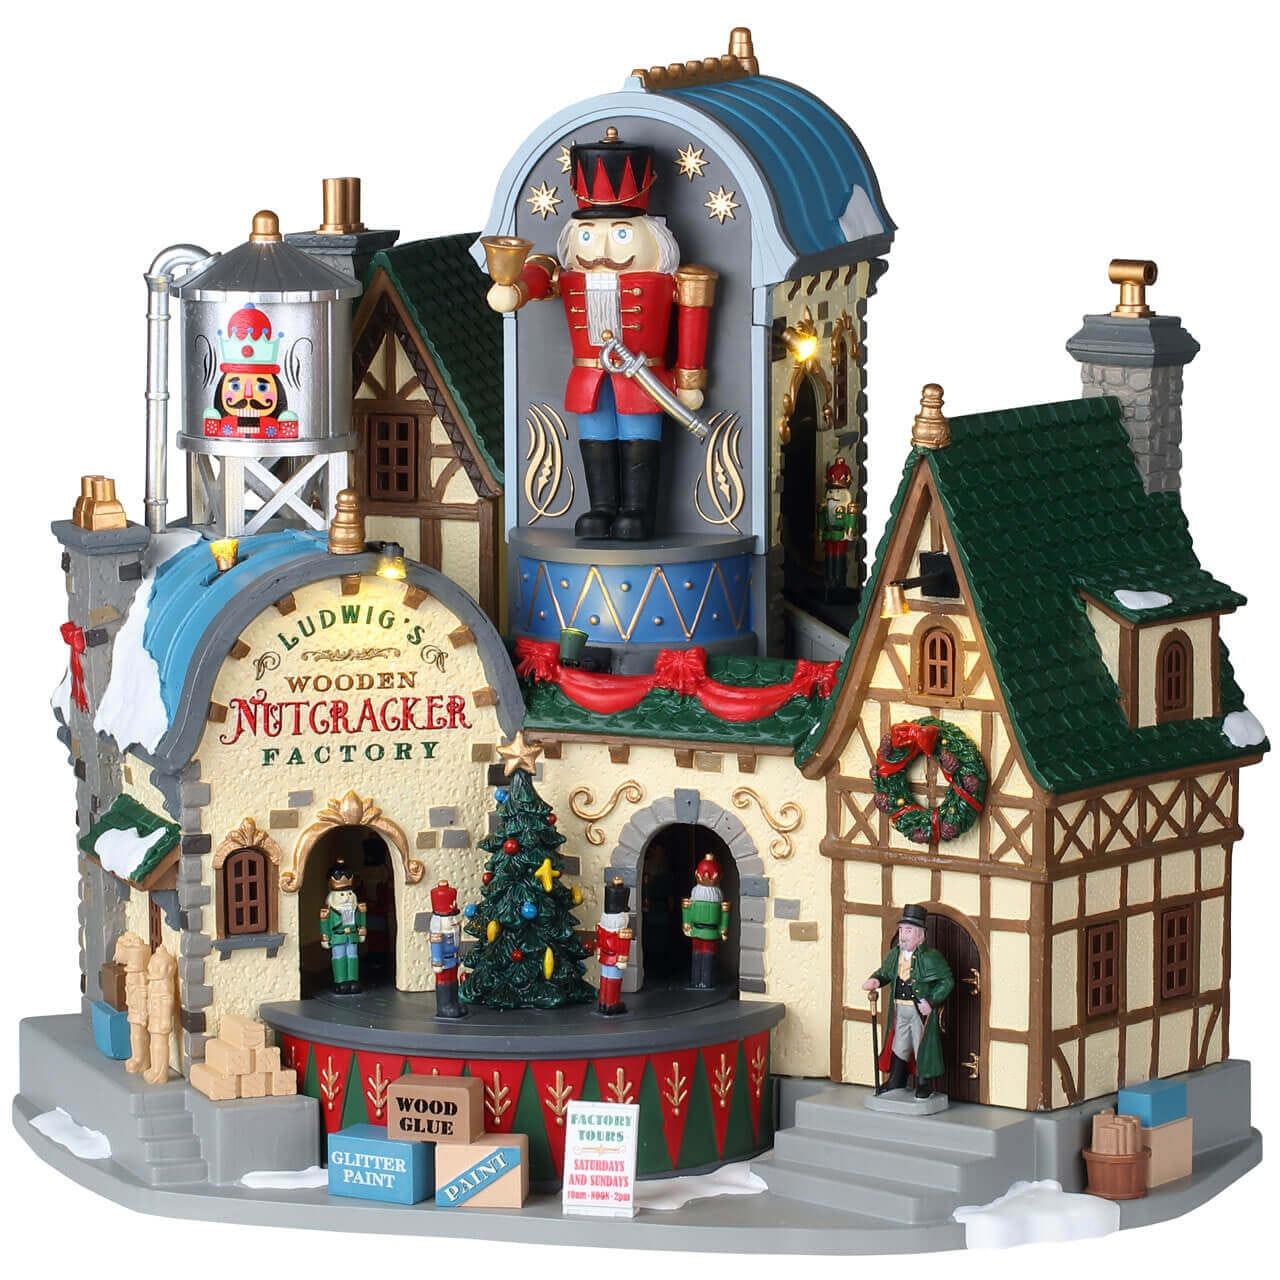 Weihnachtsdorf Winterdorf Modellbau LEMAX Come See The Nutcracker